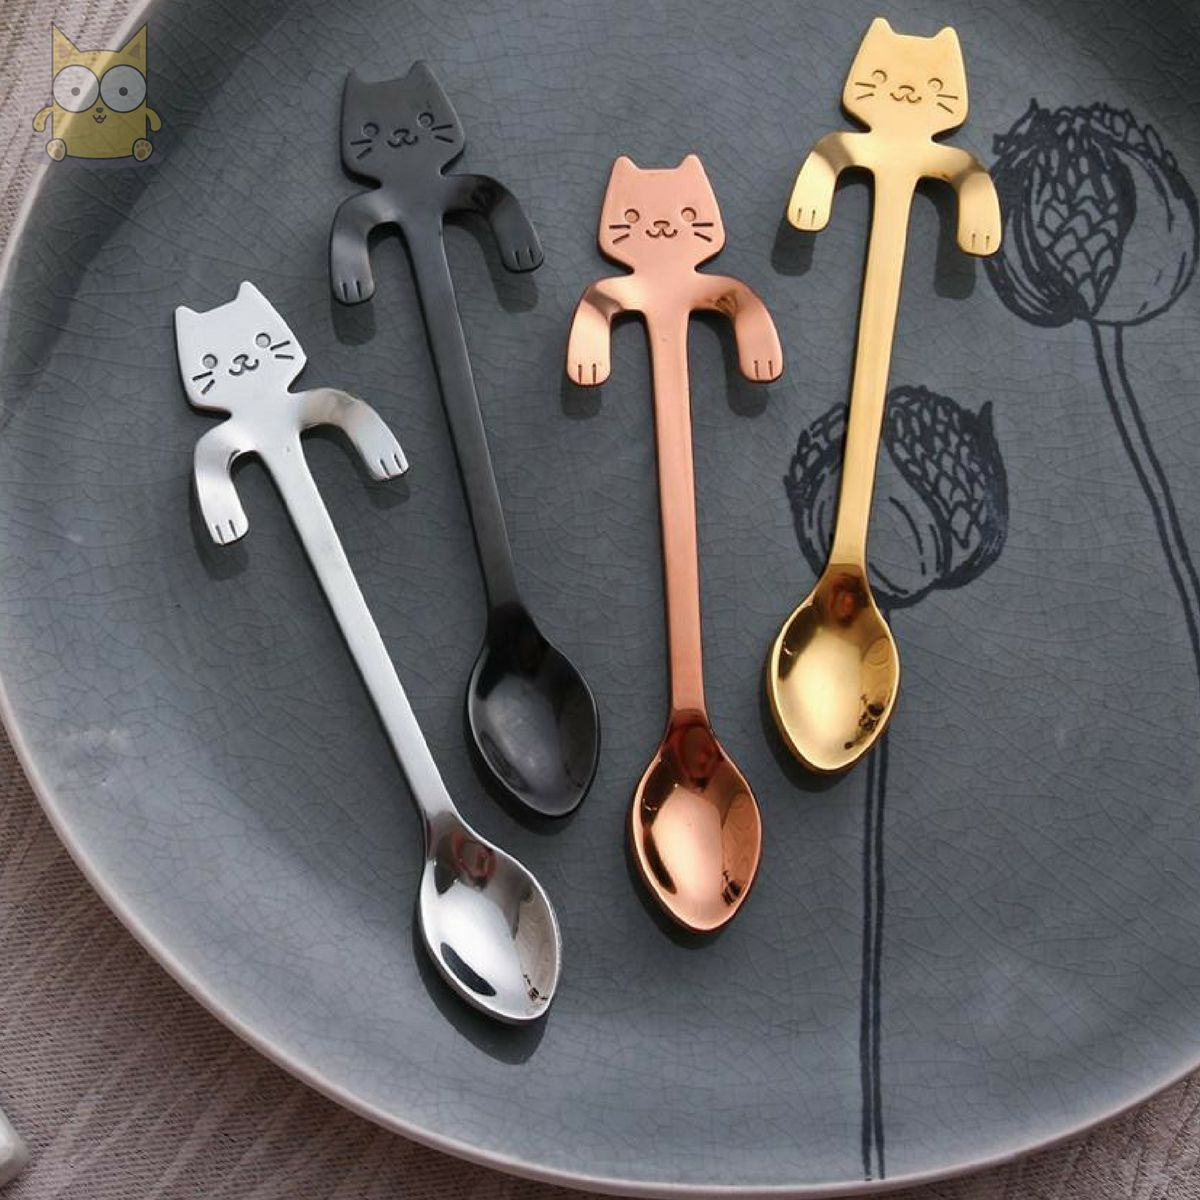 Stainless Steel Cat Teaspoons